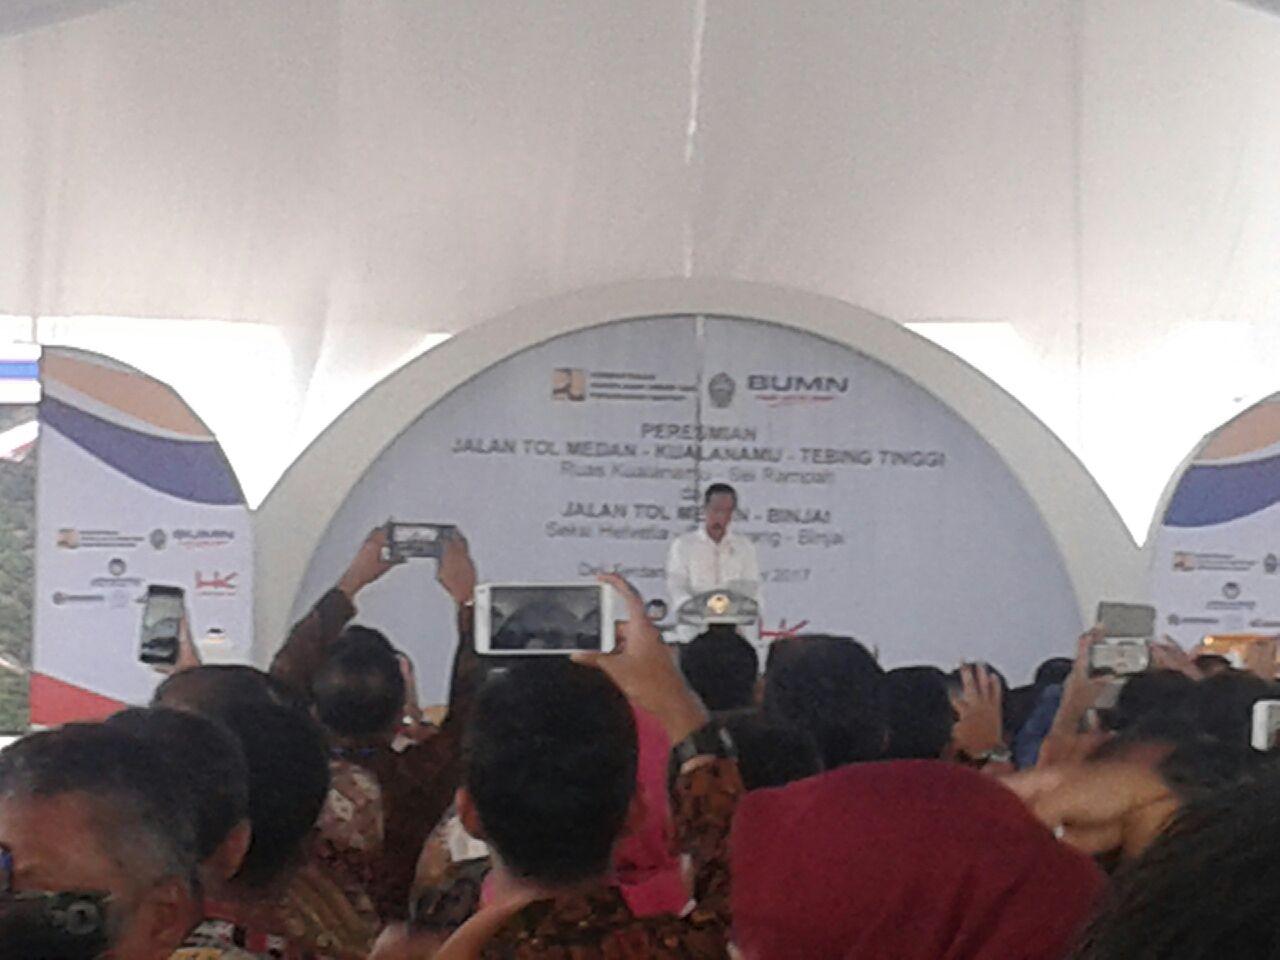 https: img-k.okeinfo.net content 2017 10 13 320 1794901 sering-ke-sumatra-utara-jokowi-saya-hampir-jadi-orang-batak-keoh5WCCOq.jpg